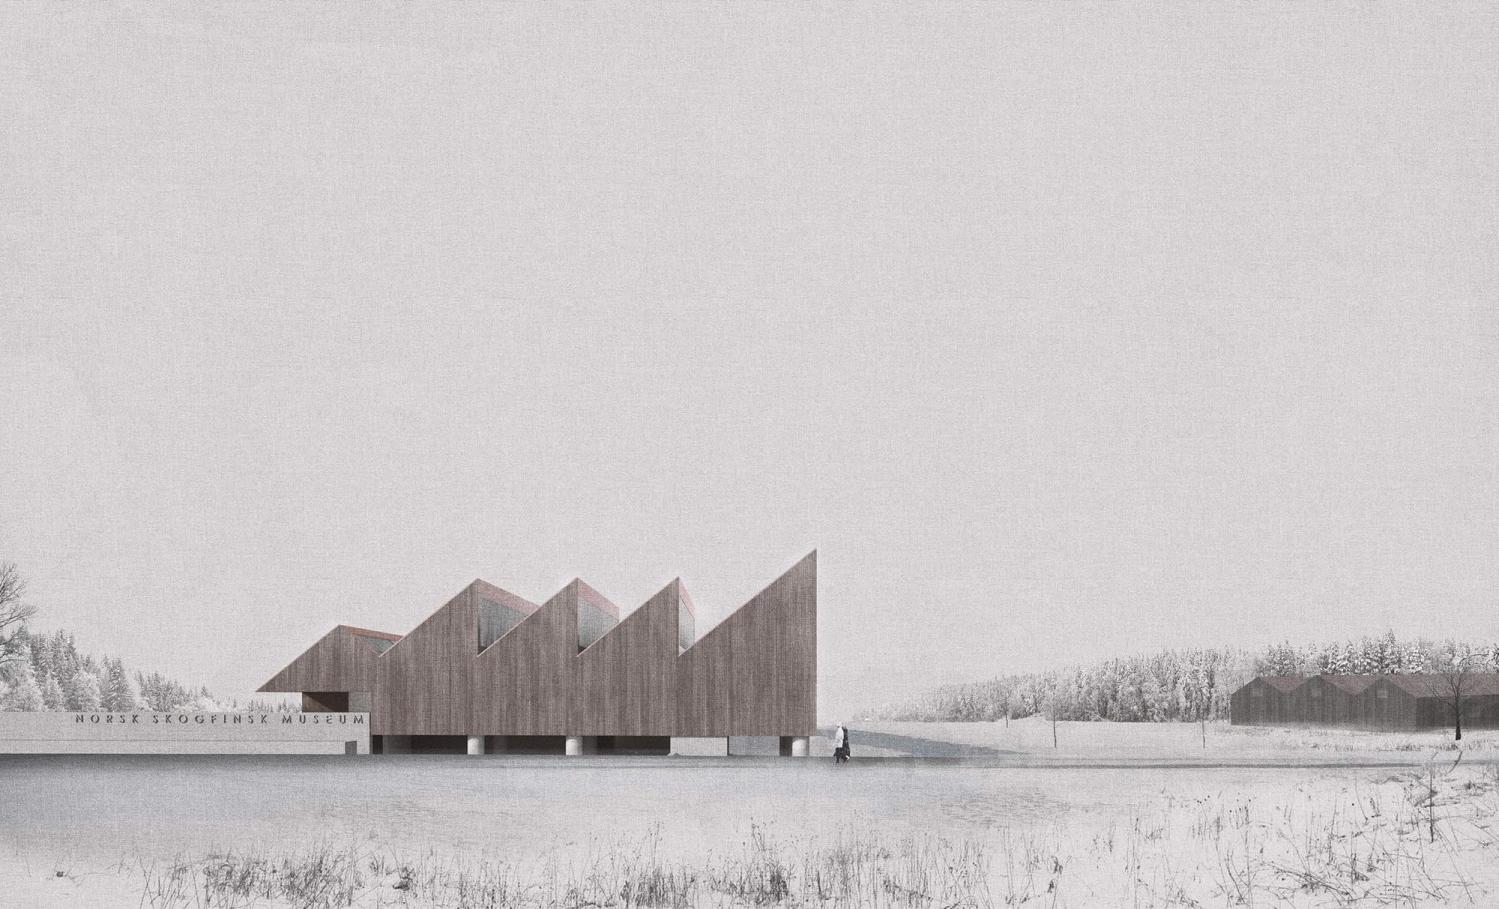 X01-entry-.-Skogfinsk-Museum-.-Svullrya-1.jpg